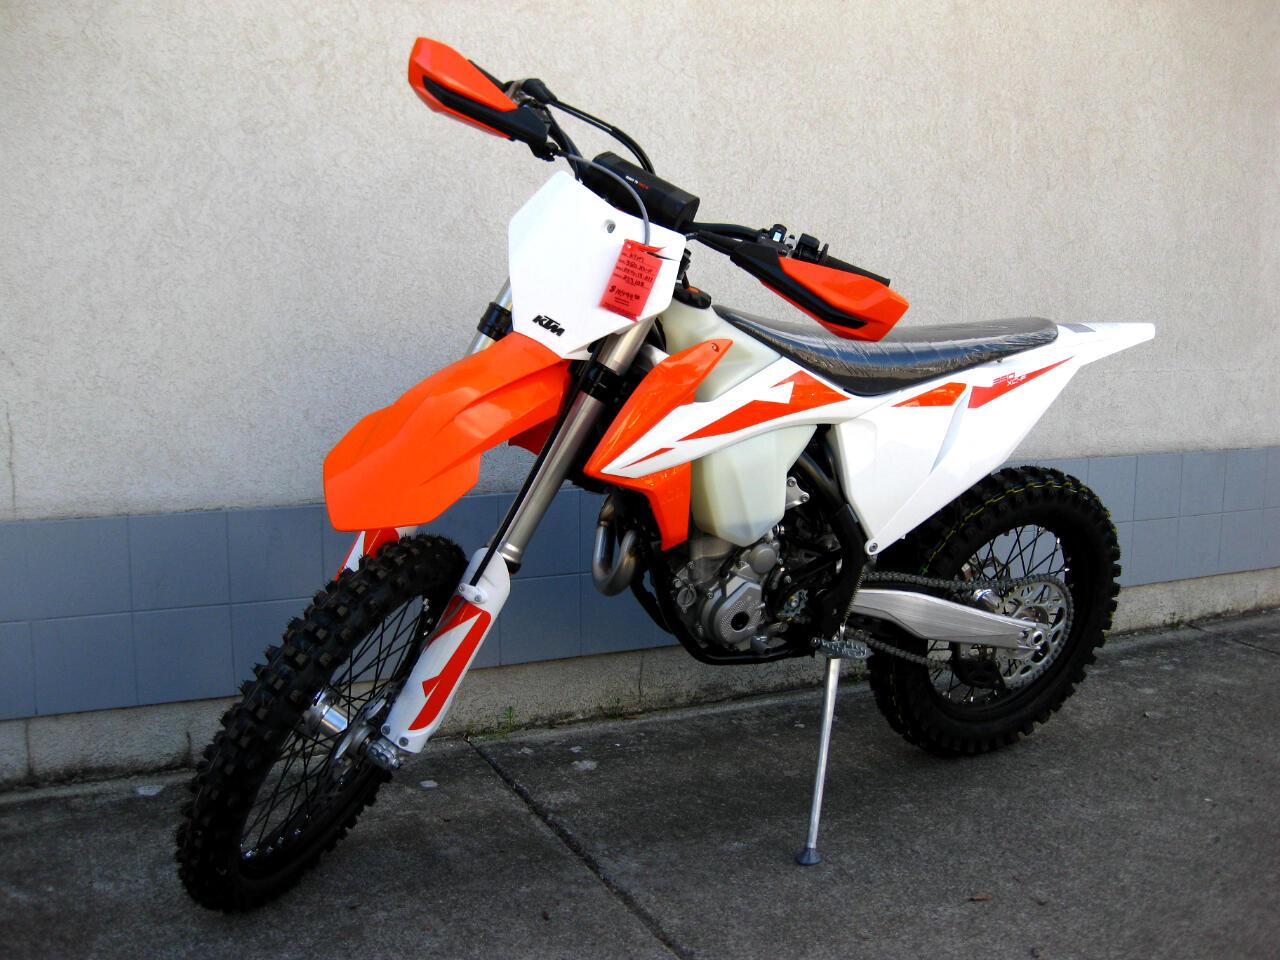 2019 KTM 350 XC-F